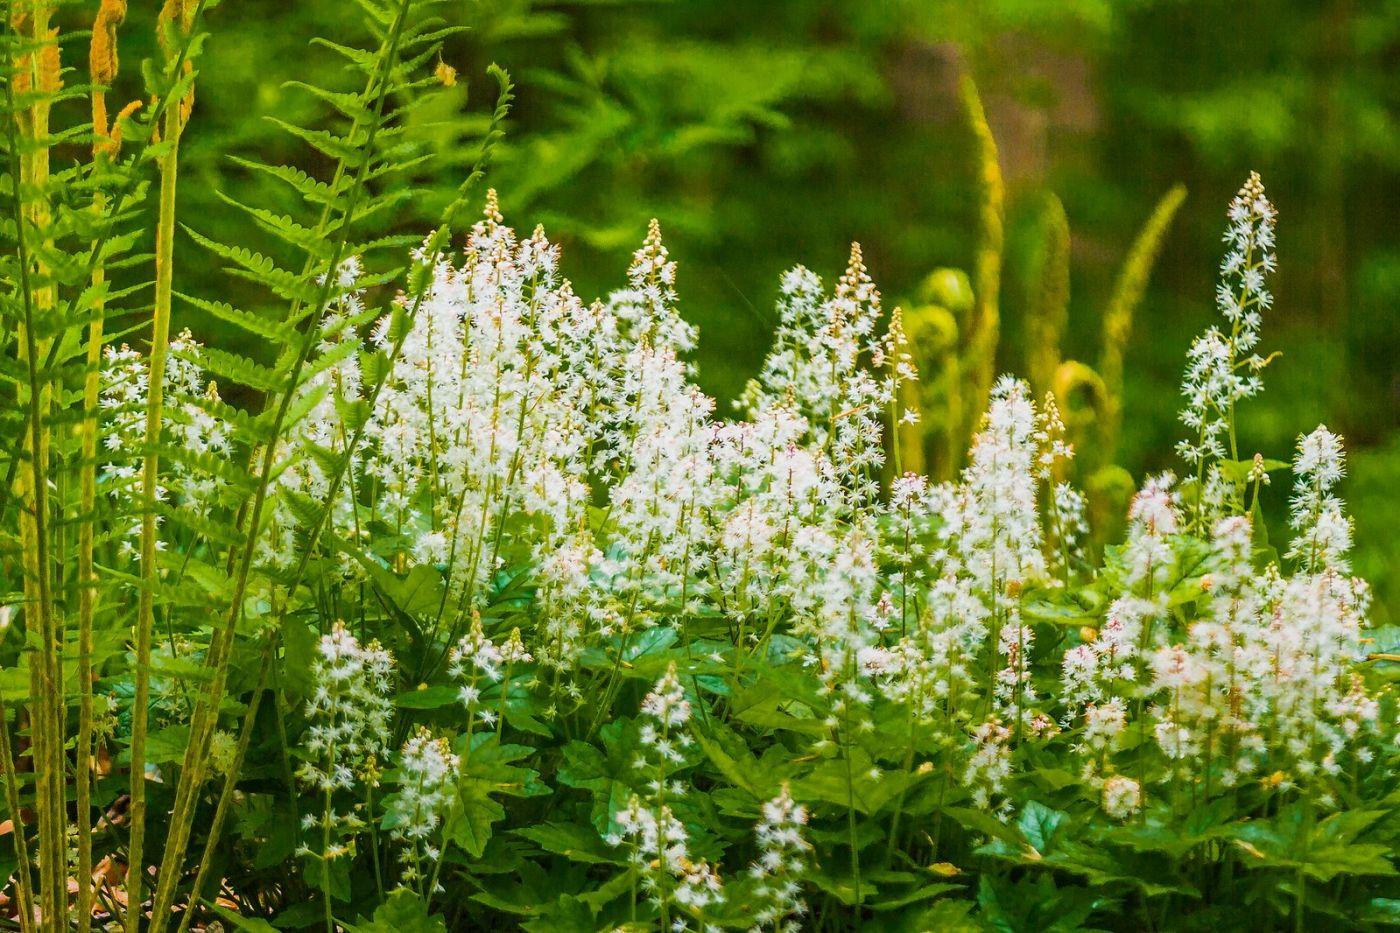 Chanticleer花园,有梦想的季节_图1-13